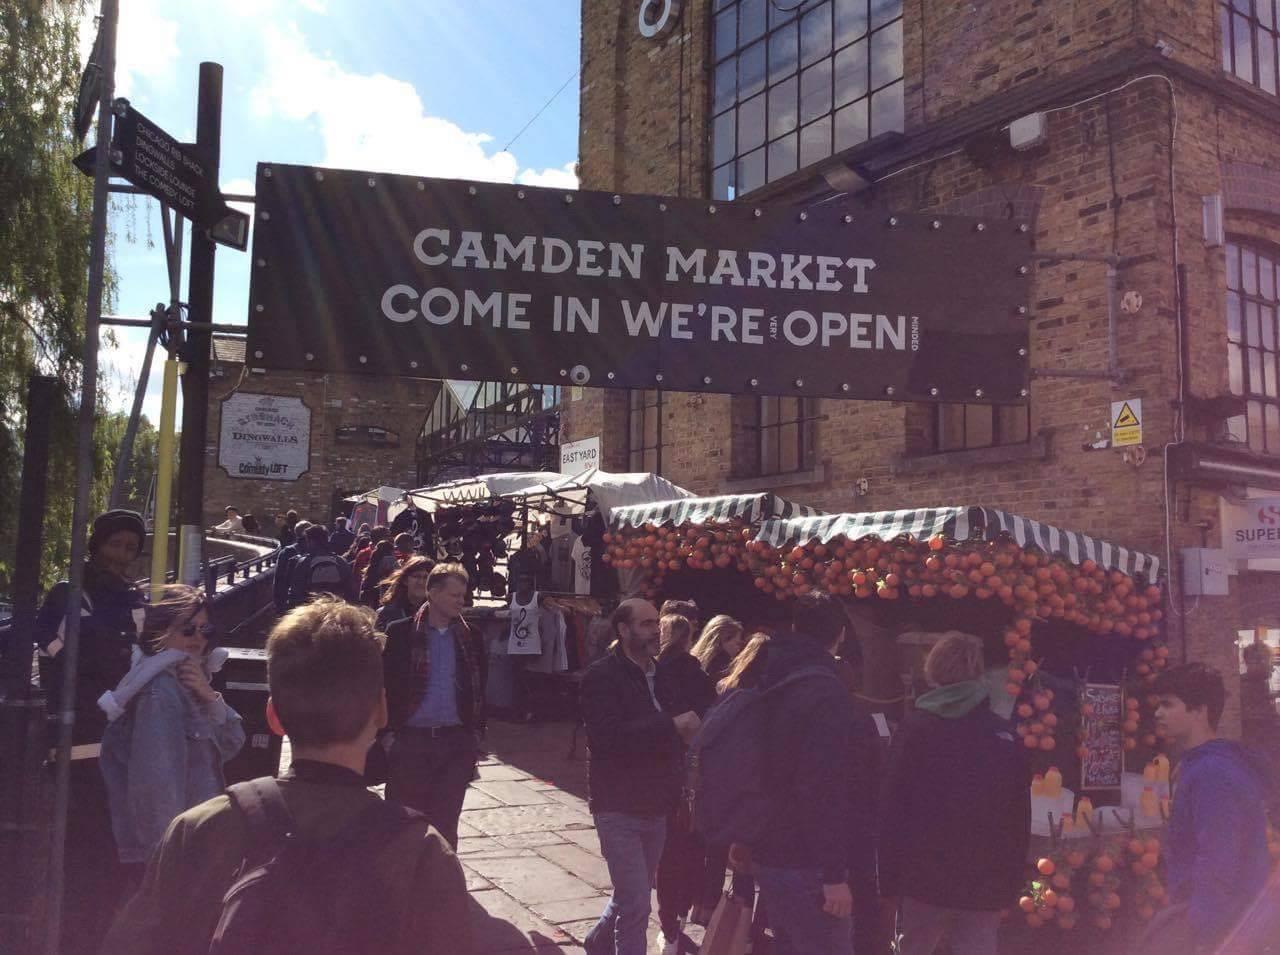 Photo 1: Camden Market